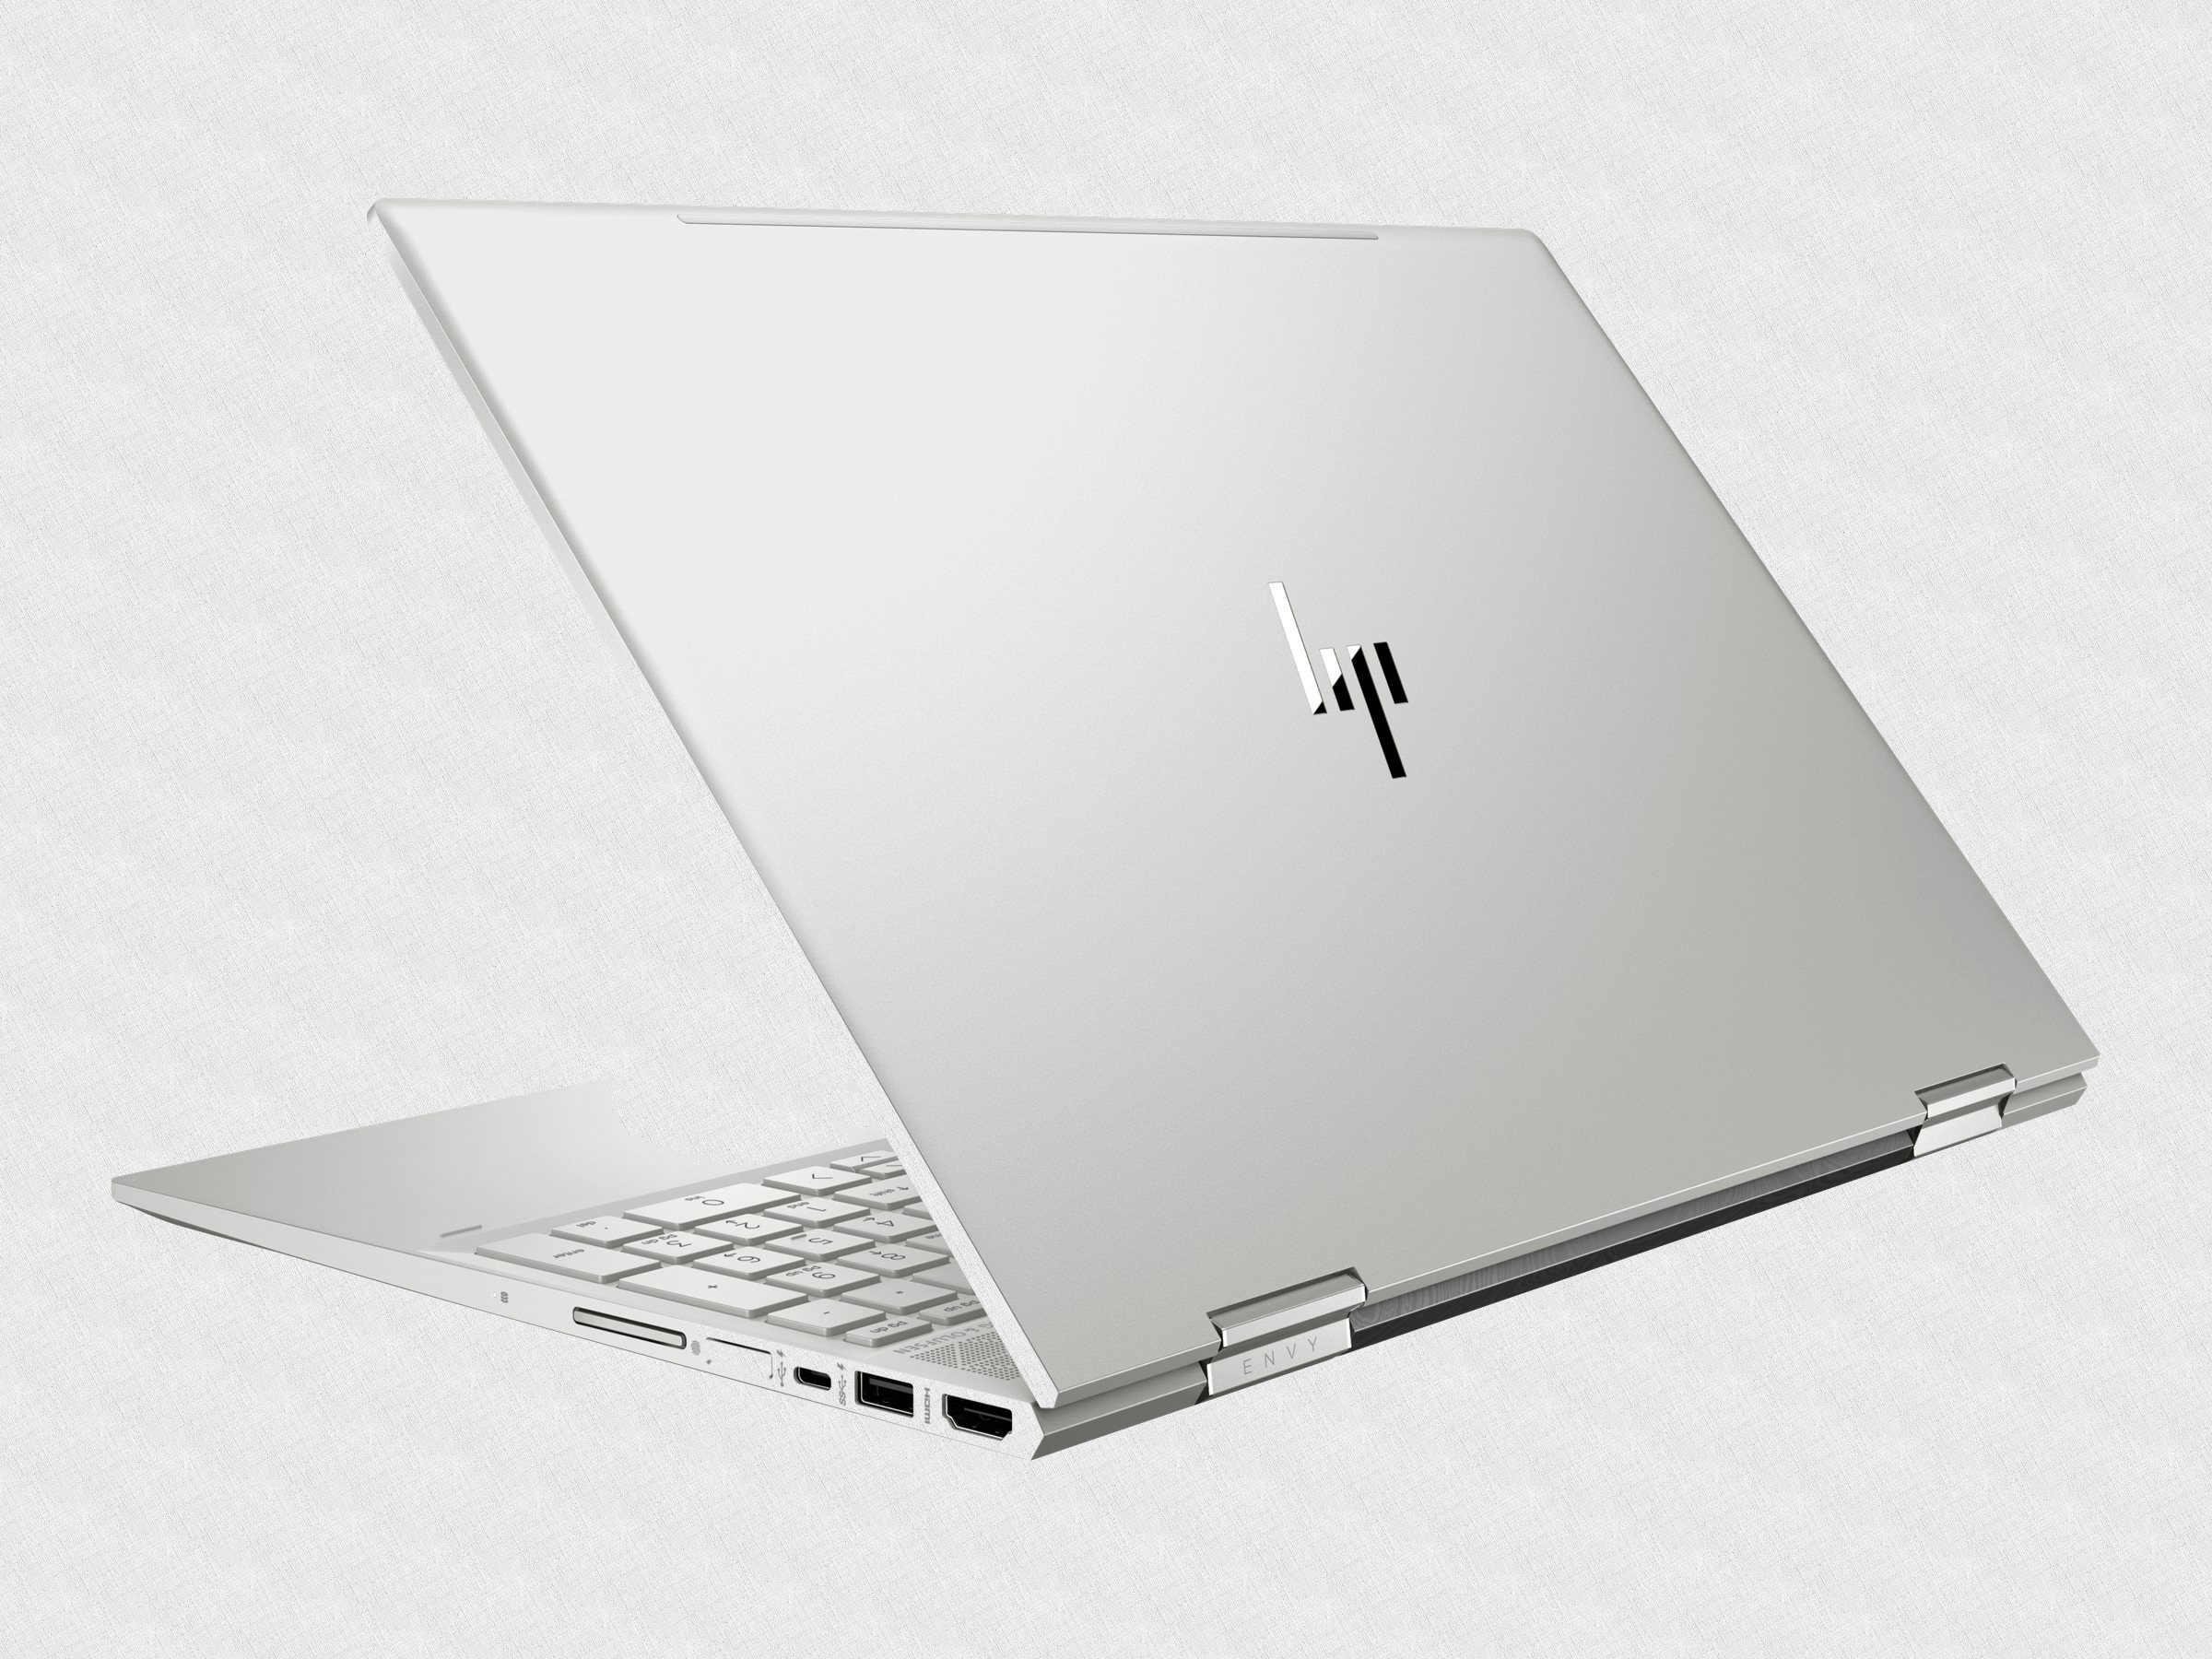 HP Envy x360 15 cn0005ur Silver 4GR05EA